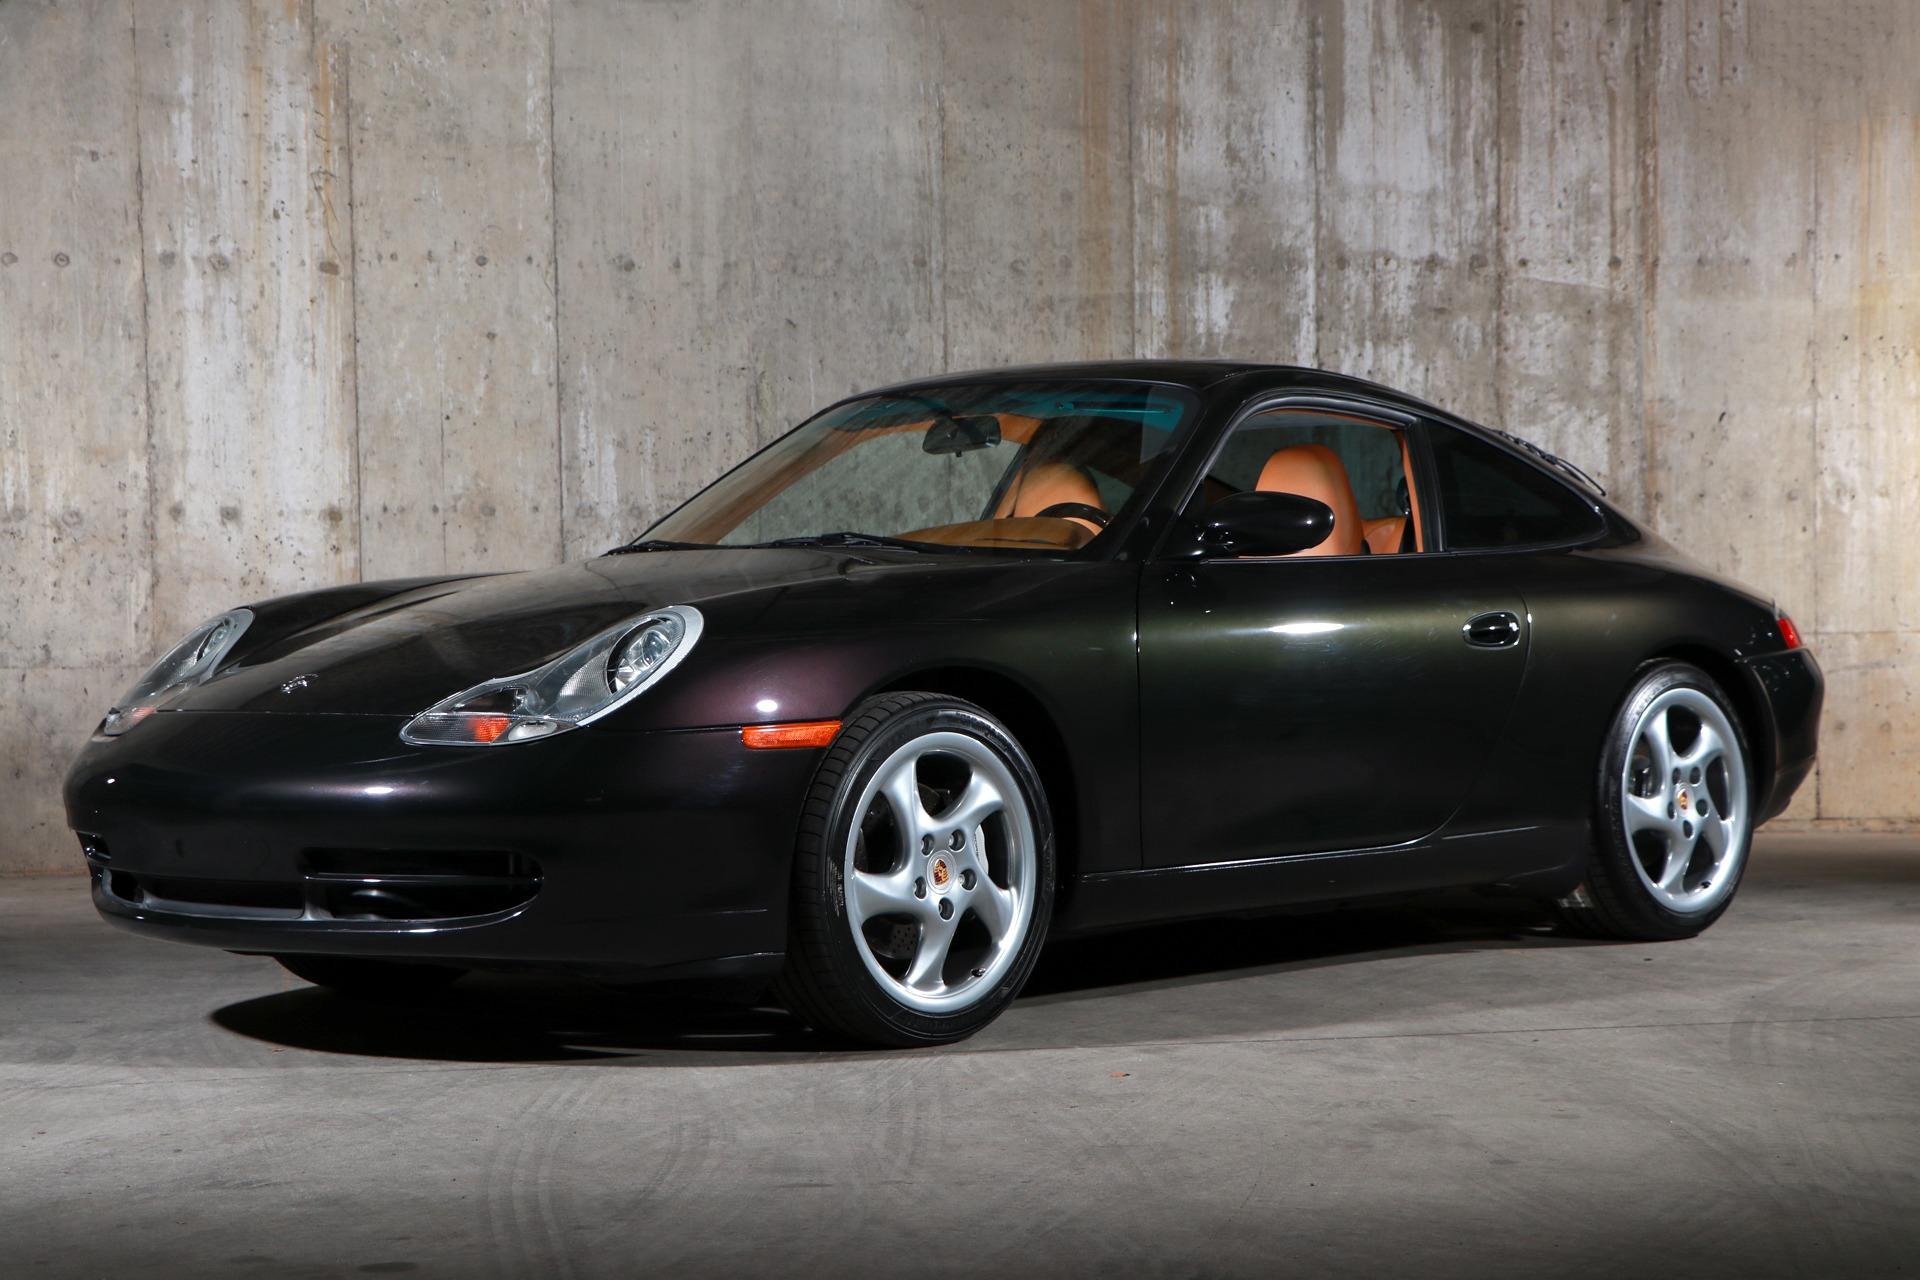 Porsche 996 Carrera 4 Millennium Edition